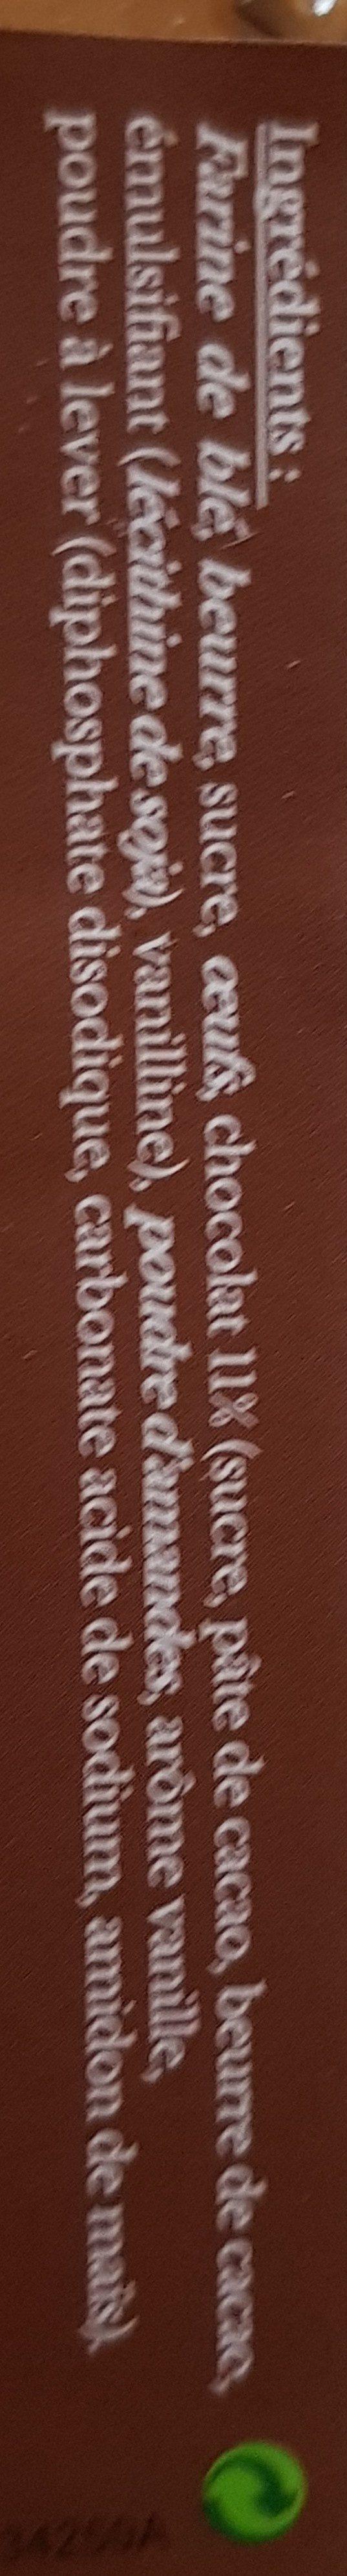 Le Croquant Chocolat - Ingrediënten - fr